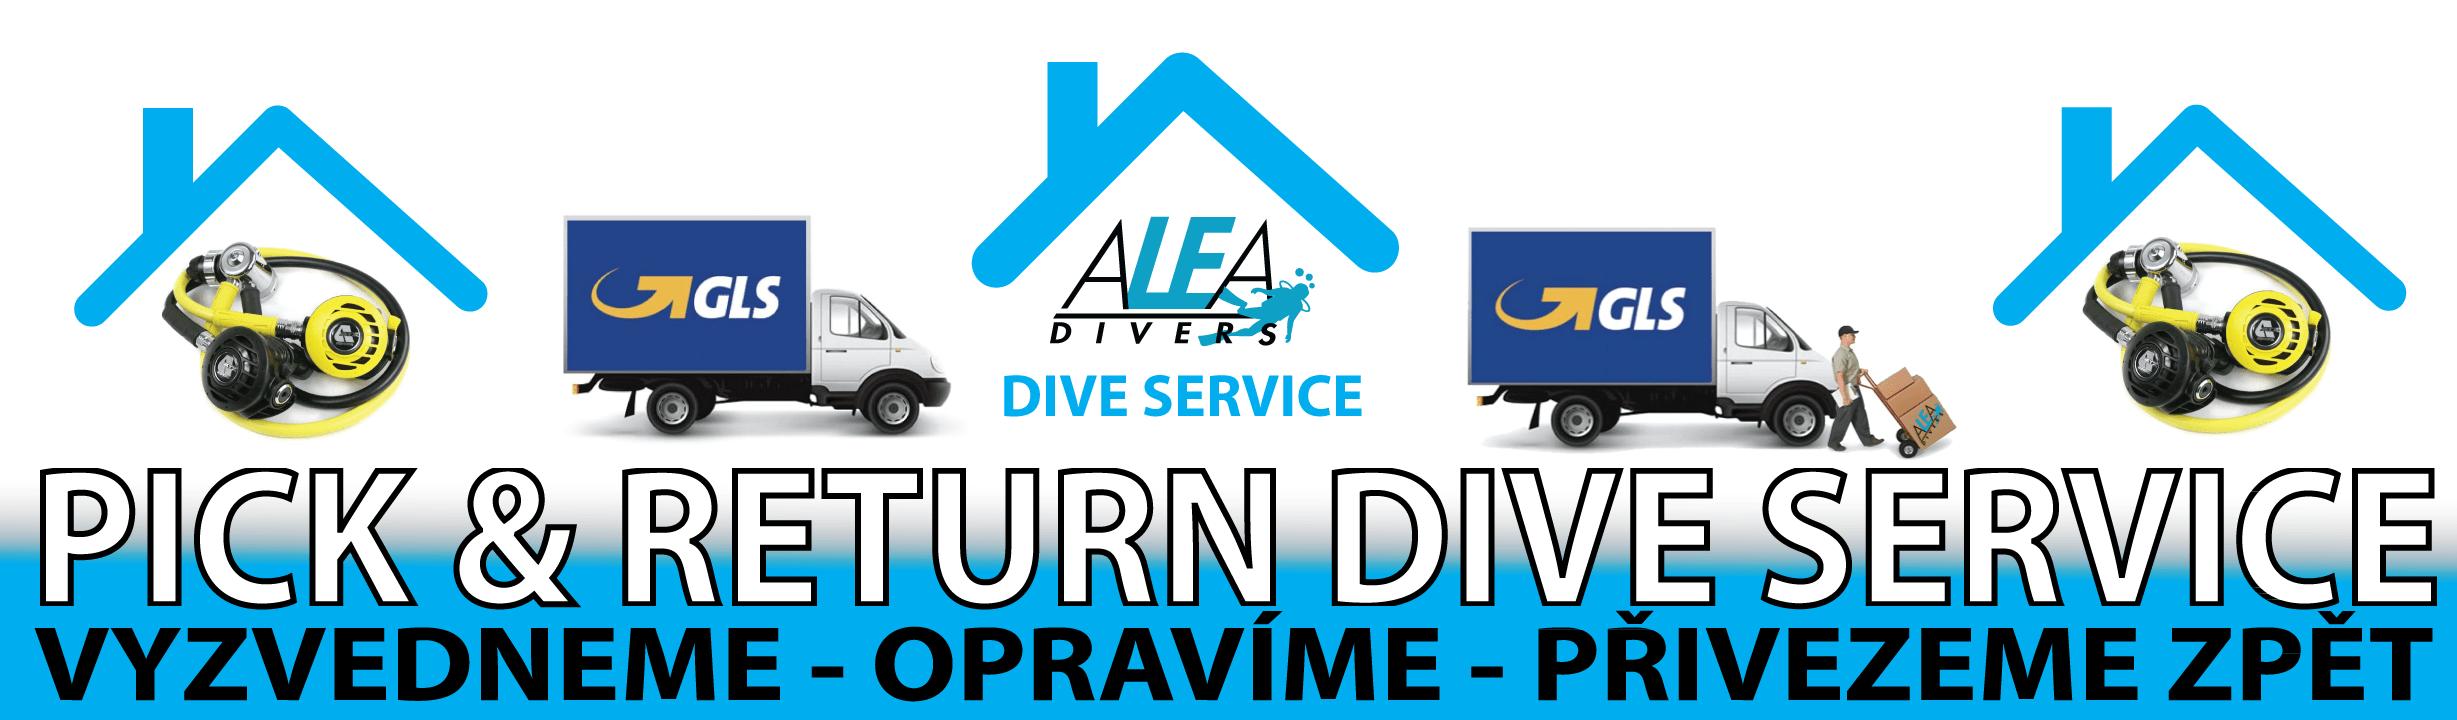 Sluzba ALEA Divers Pick and return